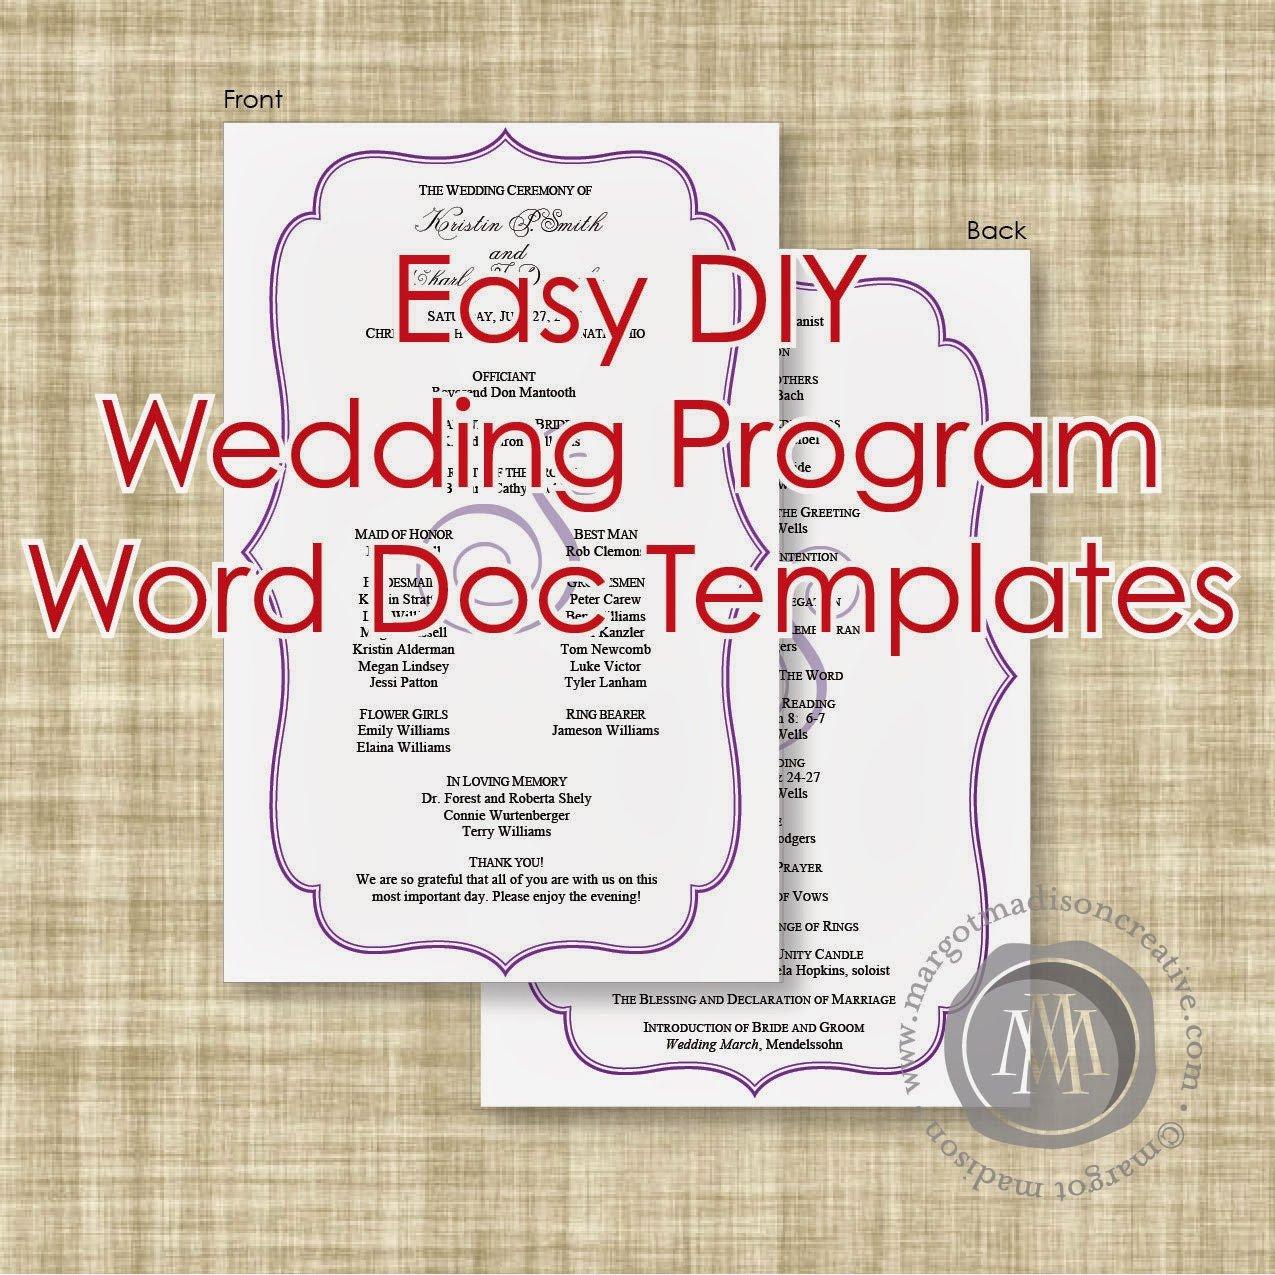 Diy Wedding Program Template Margotmadison Diy Wedding Program Word Doc Templates now